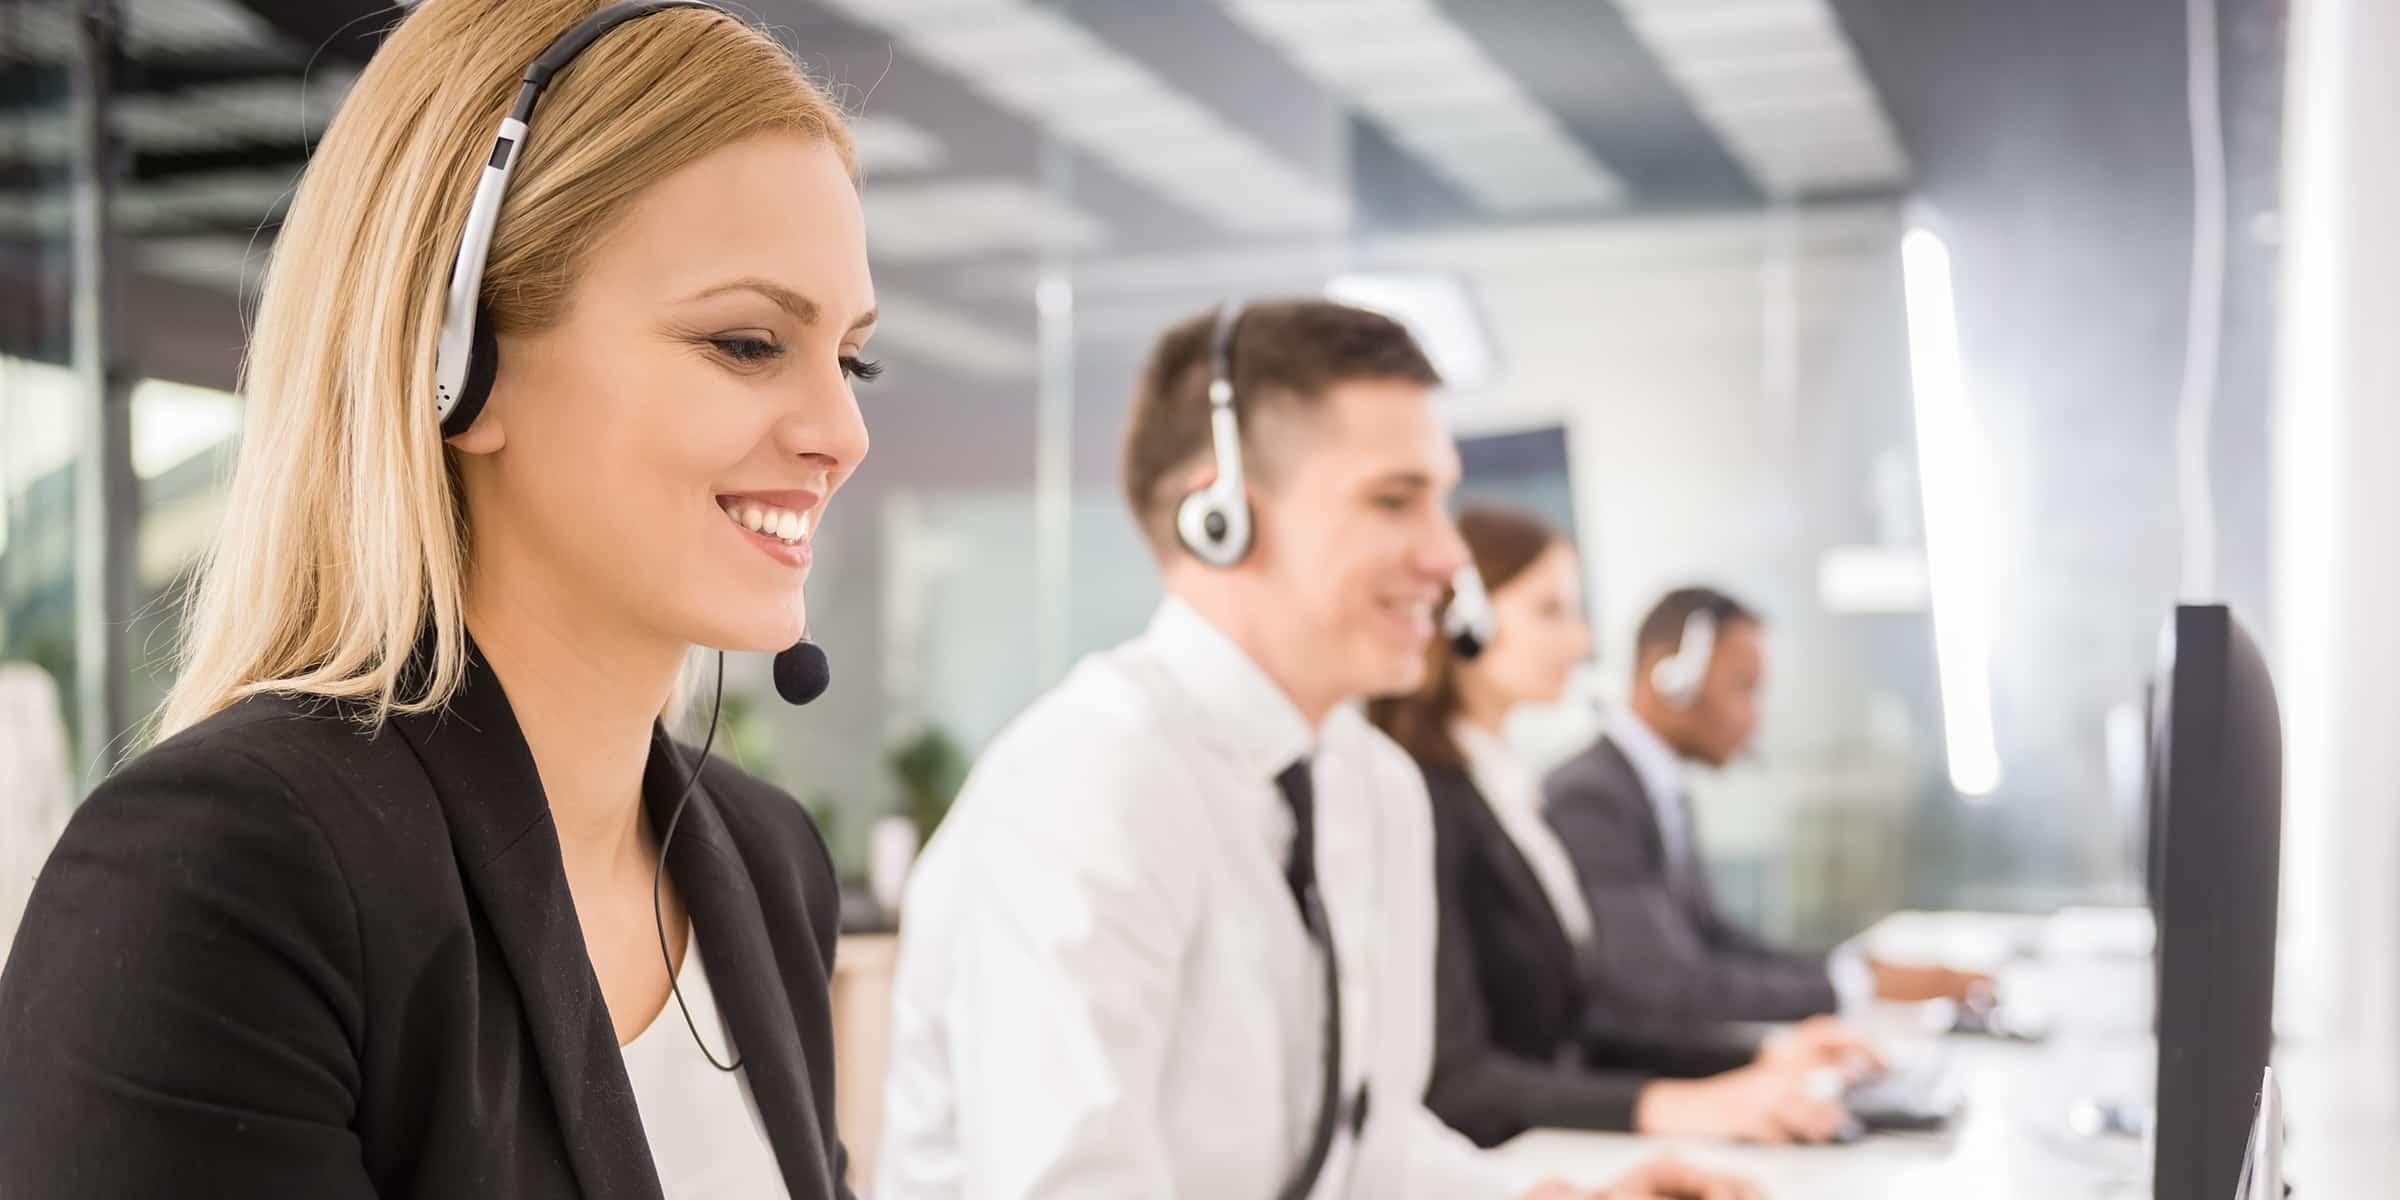 Customer service desk with headphones